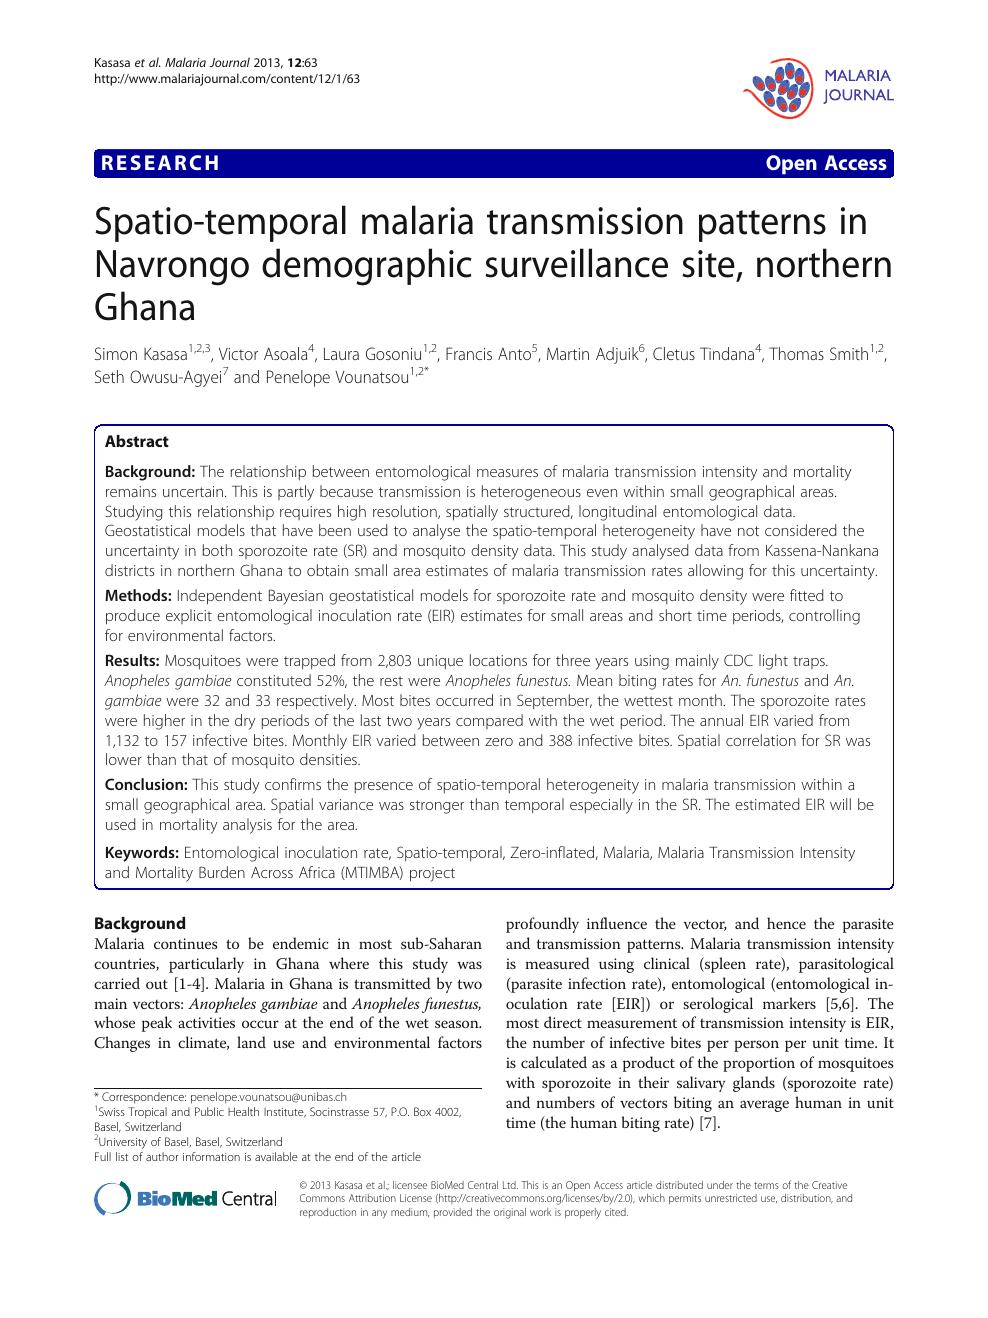 Spatio-temporal malaria transmission patterns in Navrongo